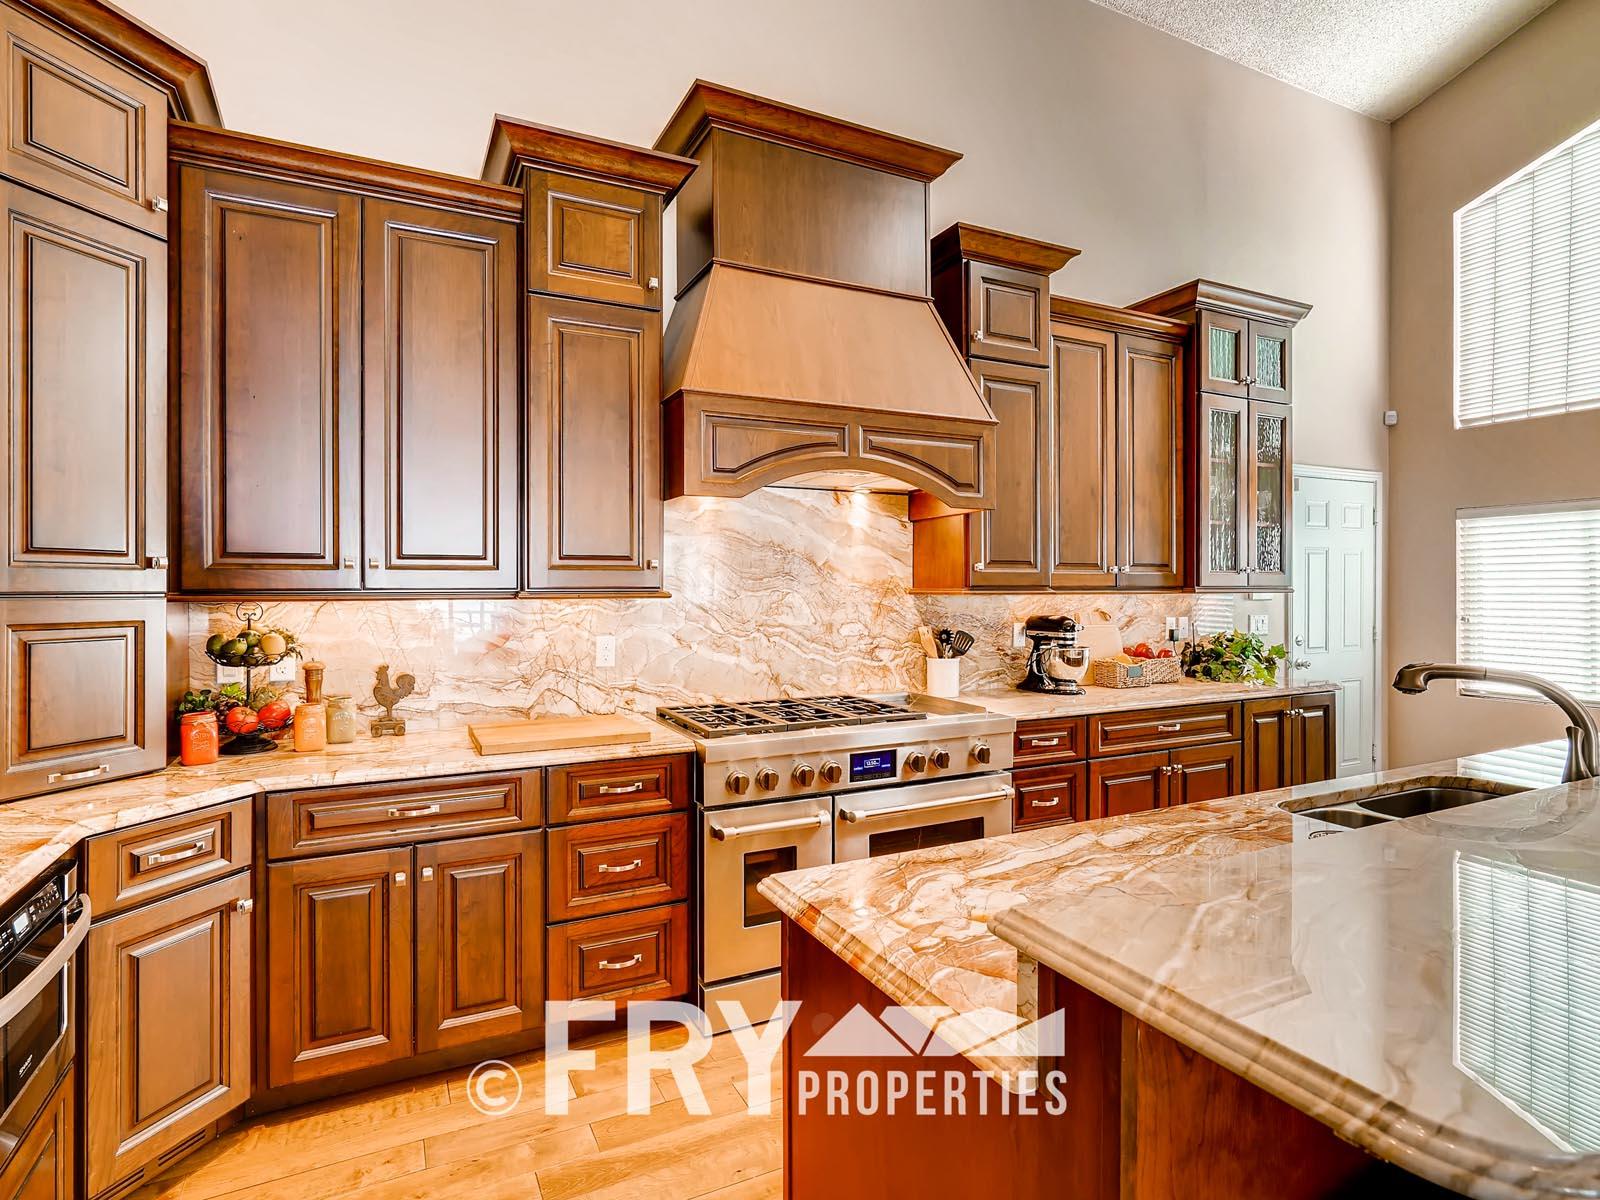 6305 W 6th Ave Unit A6-print-012-12-Kitchen-3600x2400-300dpi